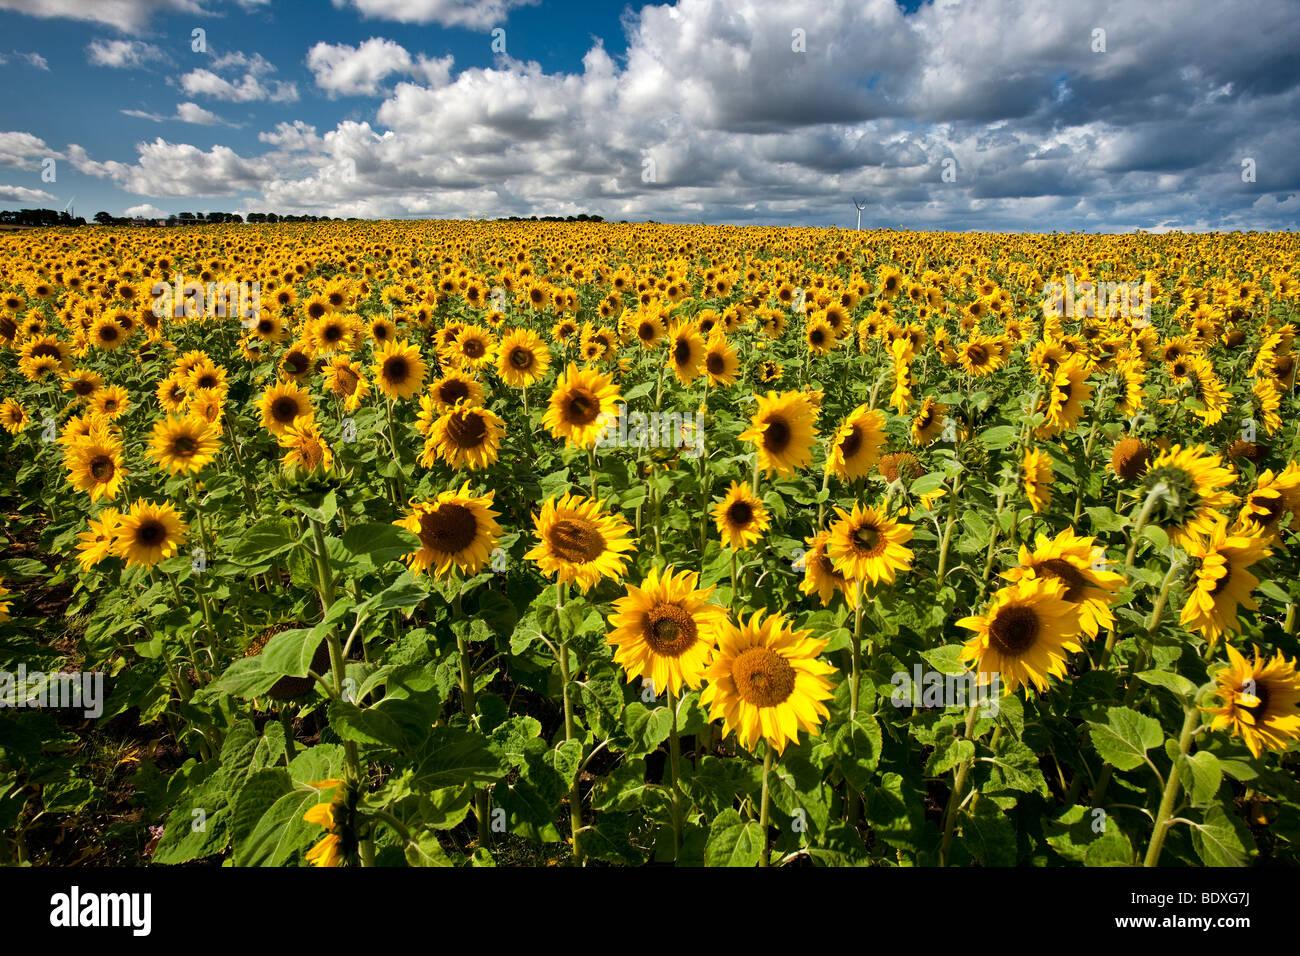 Field of Sunflowers near Hartlepool Tees Valley - Stock Image